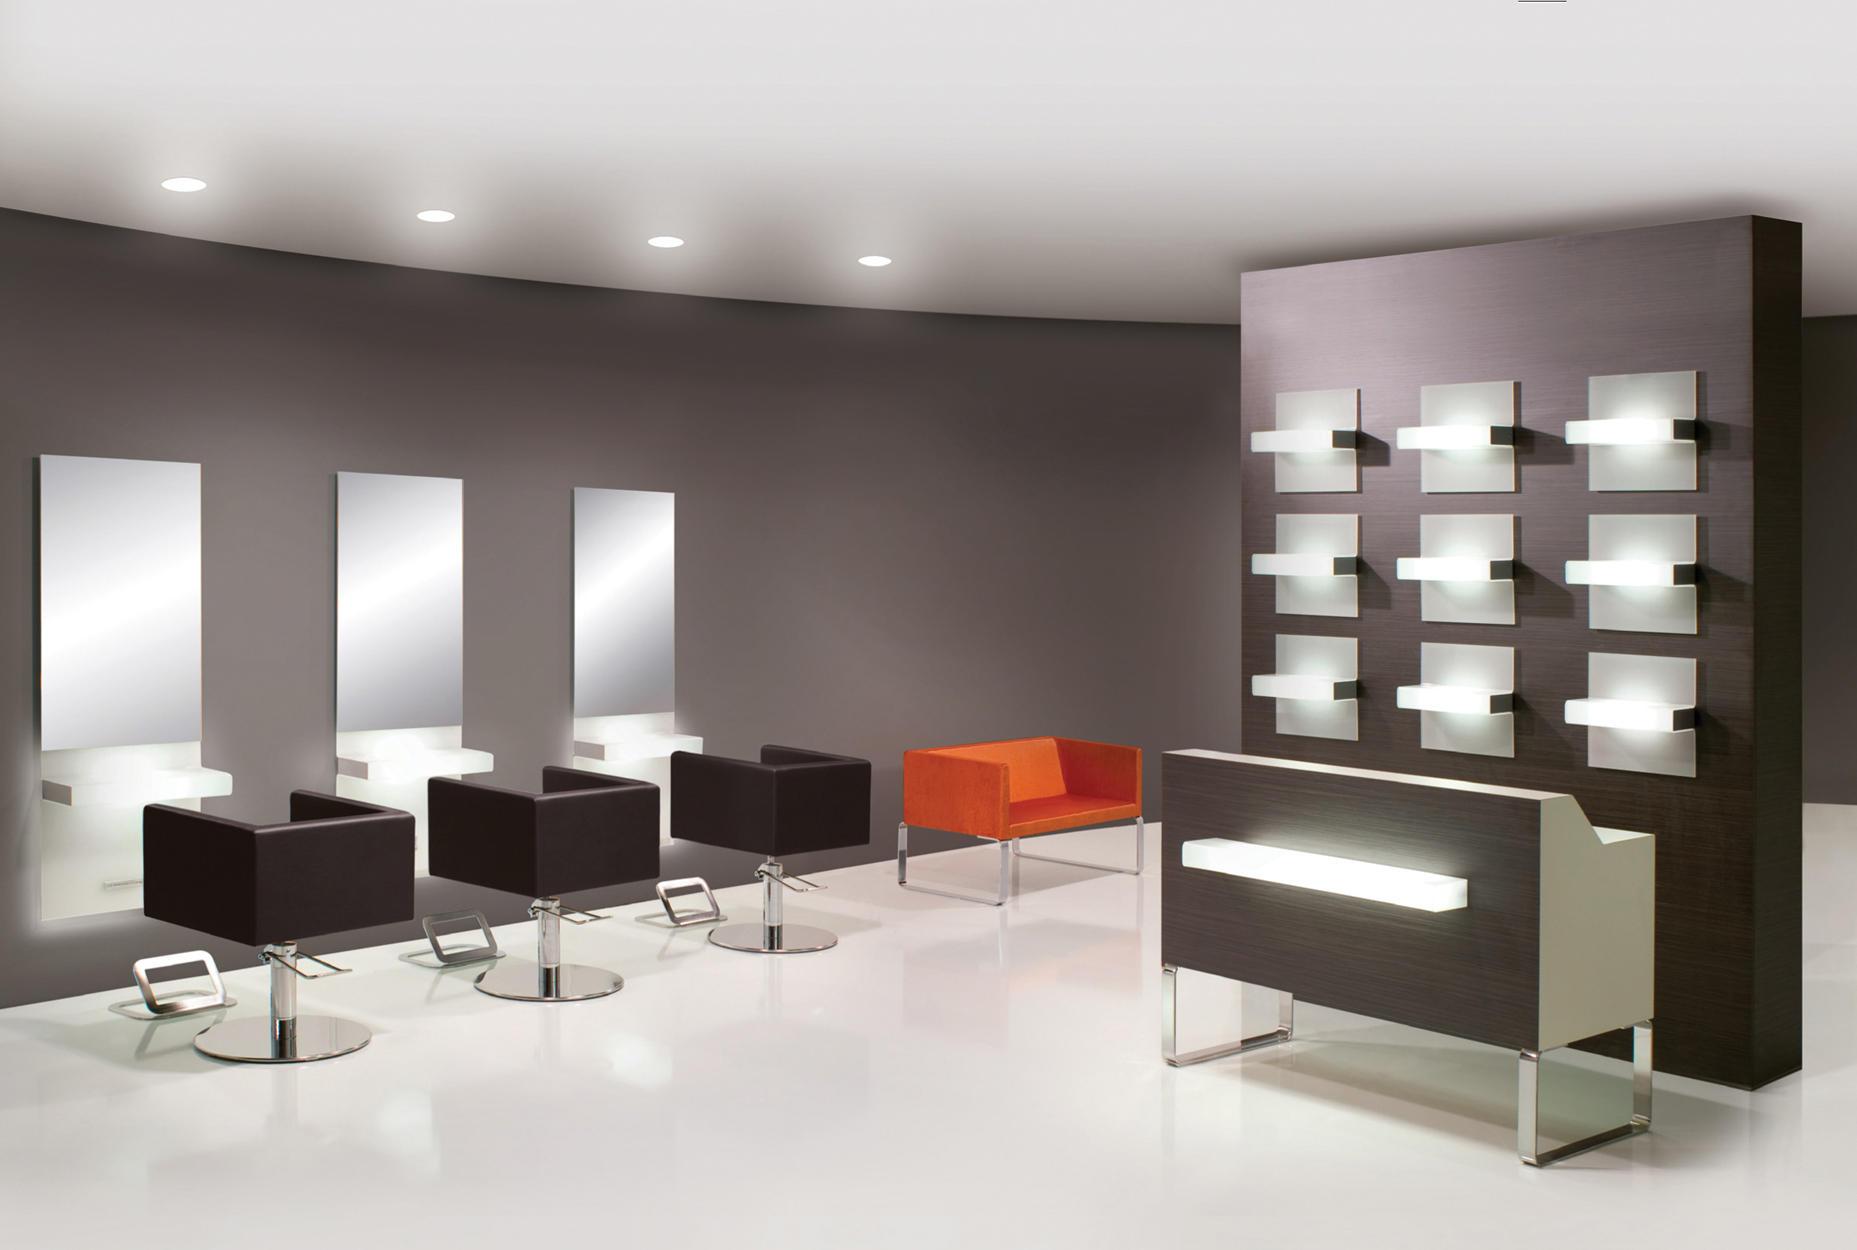 Cocodesk 220 | GAMMASTORE Salon Reception Desk by GAMMA & BROSS ...